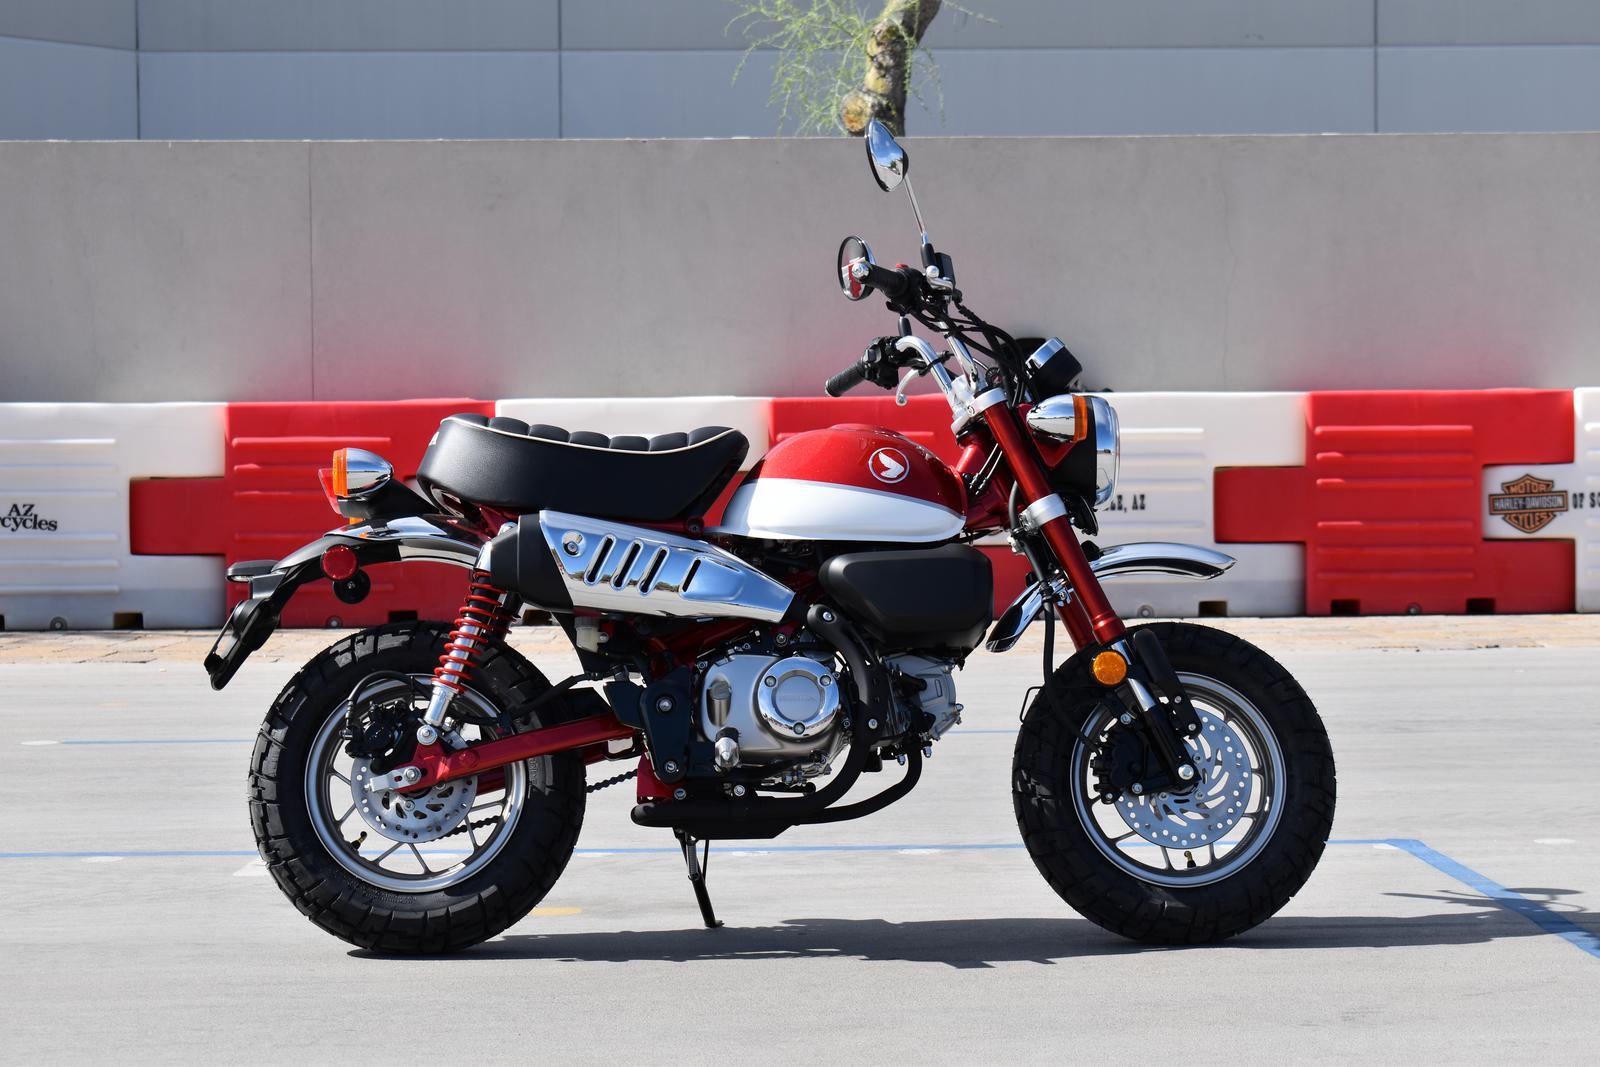 2019 Honda Monkey For Sale In Scottsdale Az Go Az Motorcycles In